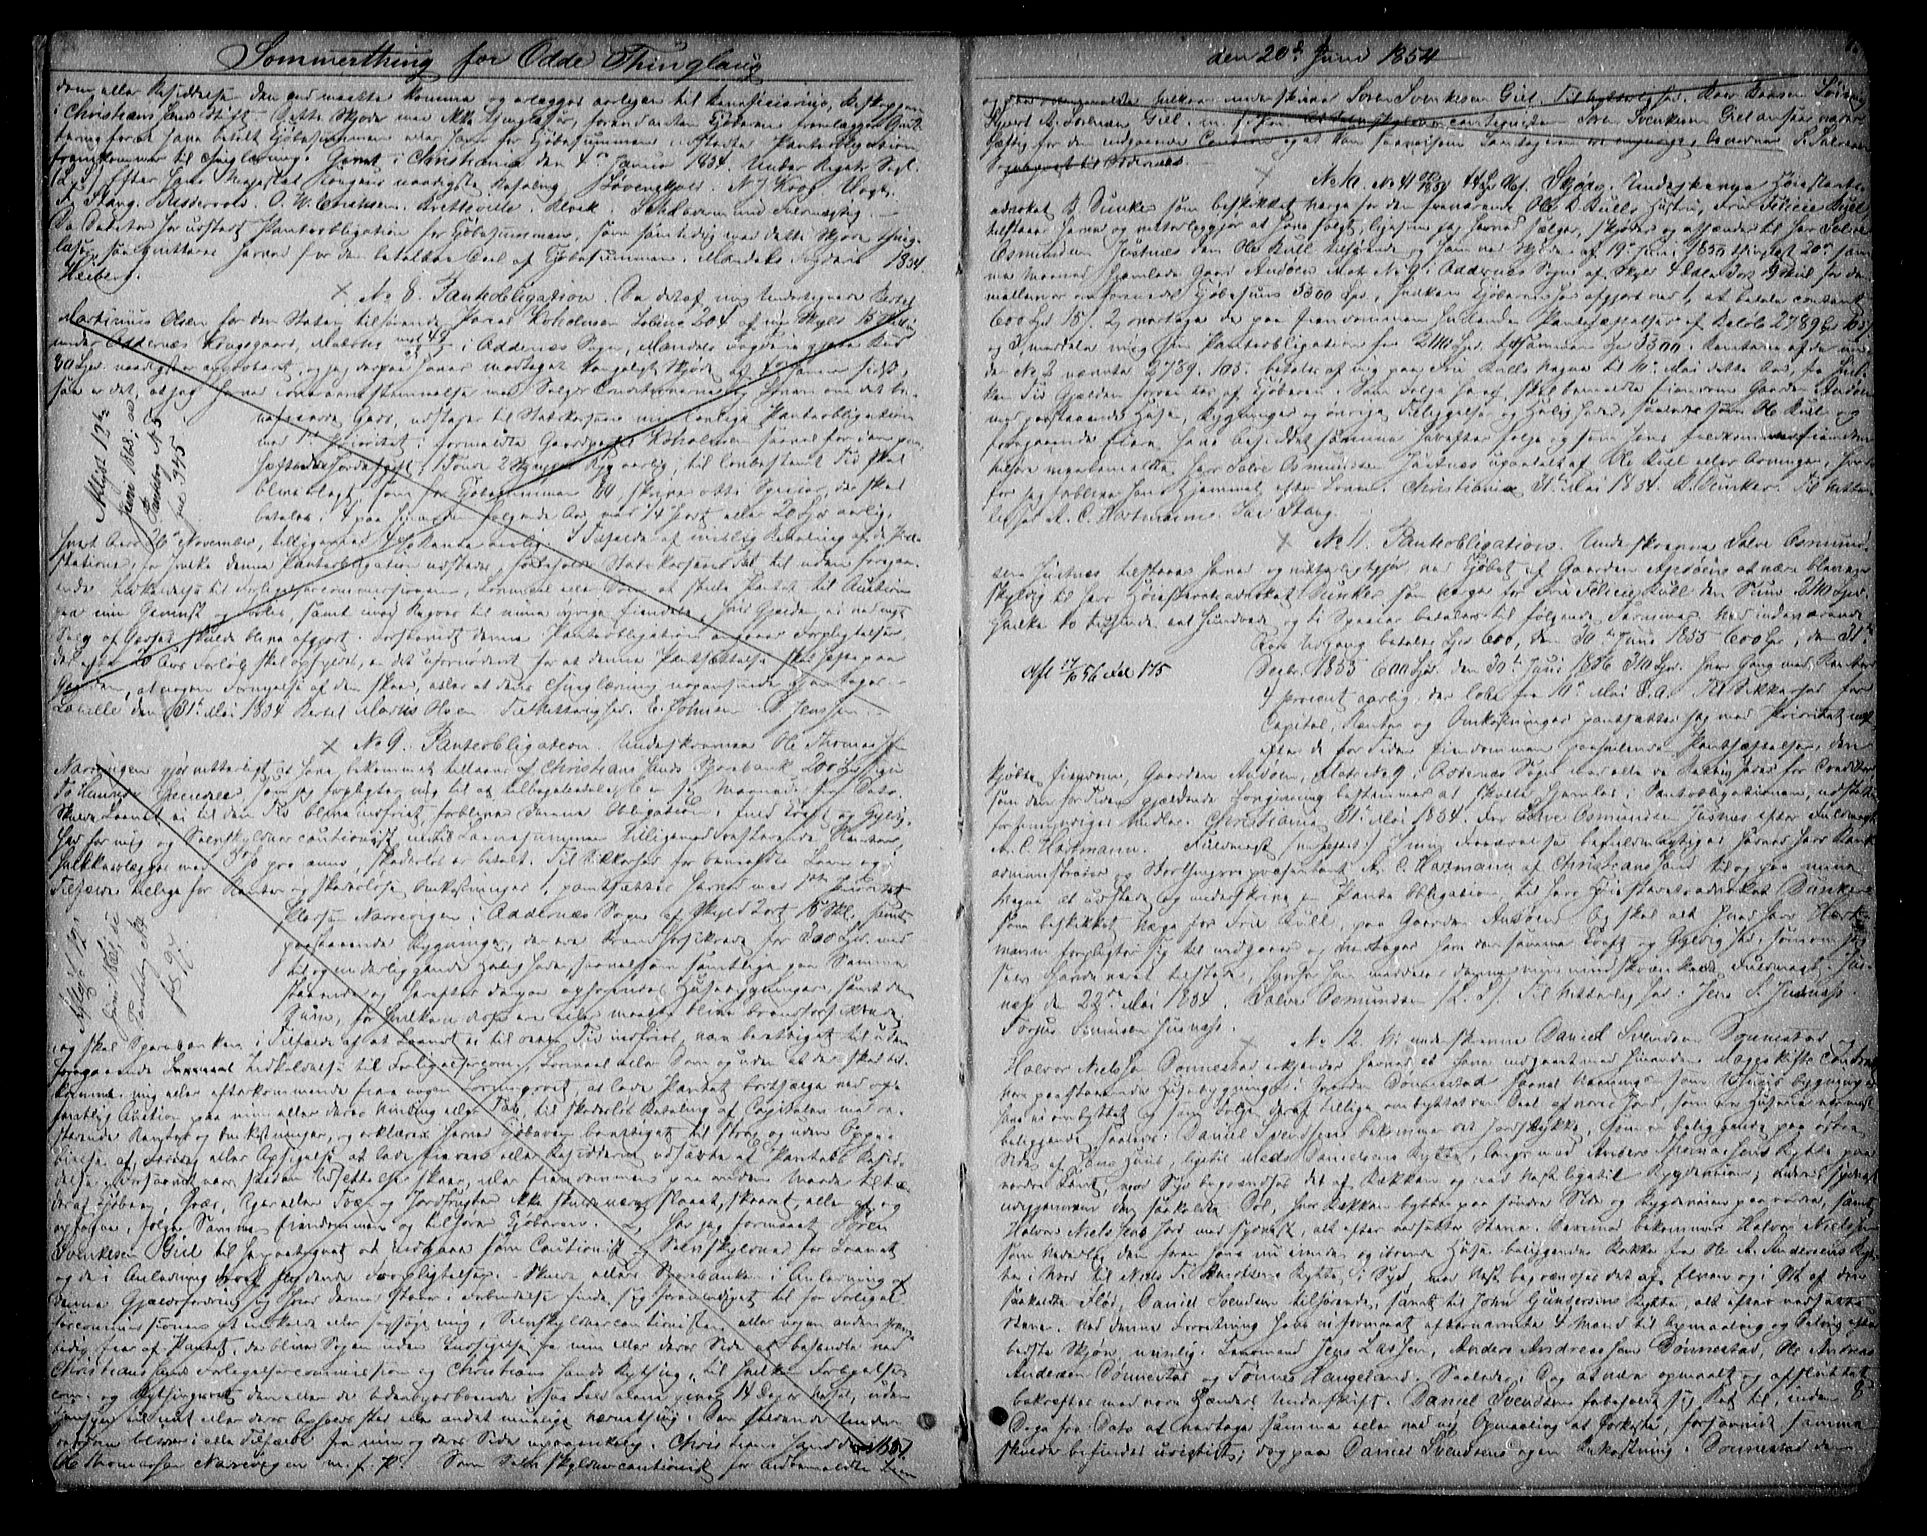 SAK, Torridal sorenskriveri, G/Gb/Gba/L0004: Pantebok nr. 3, 1854-1860, s. 7